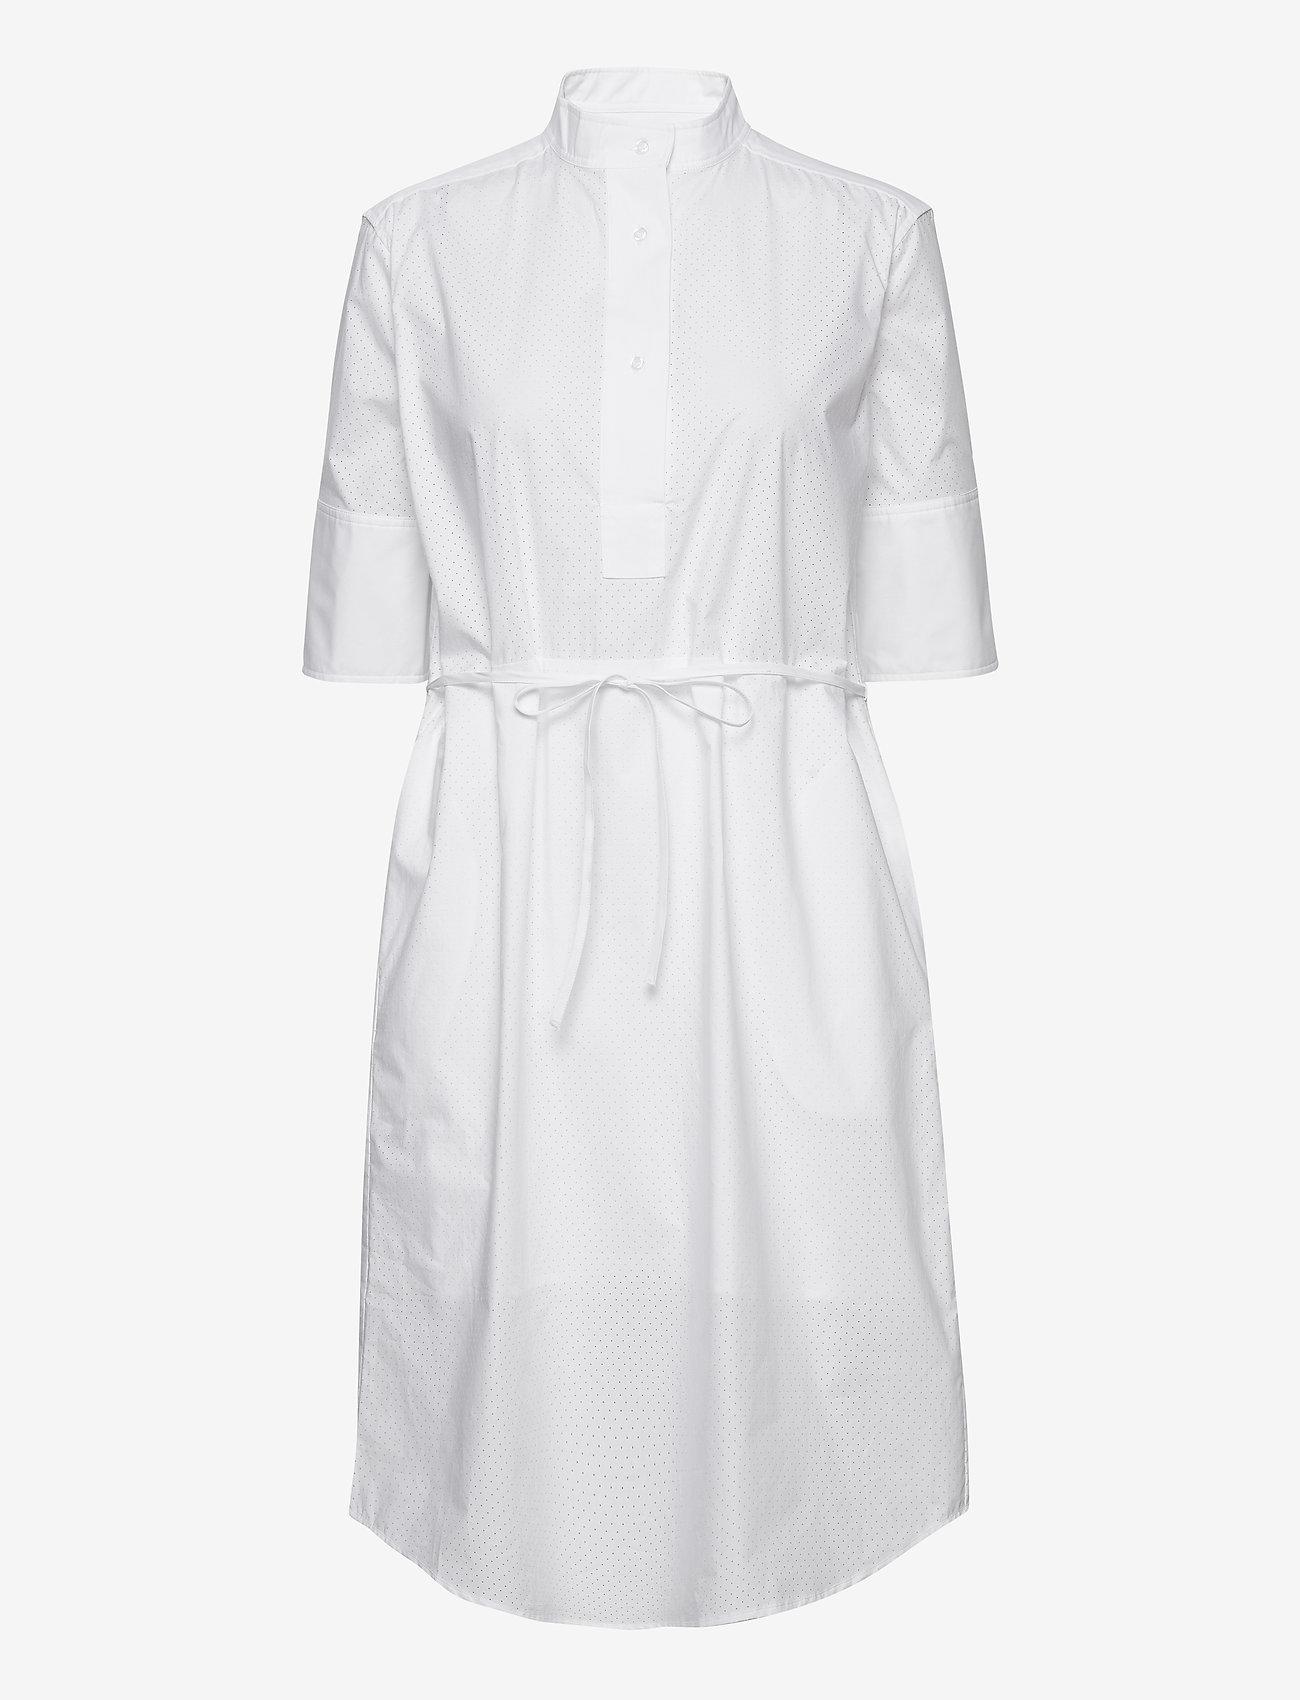 Bonnie Popover Dress (White) (159 €) - Residus gzKzEwJu